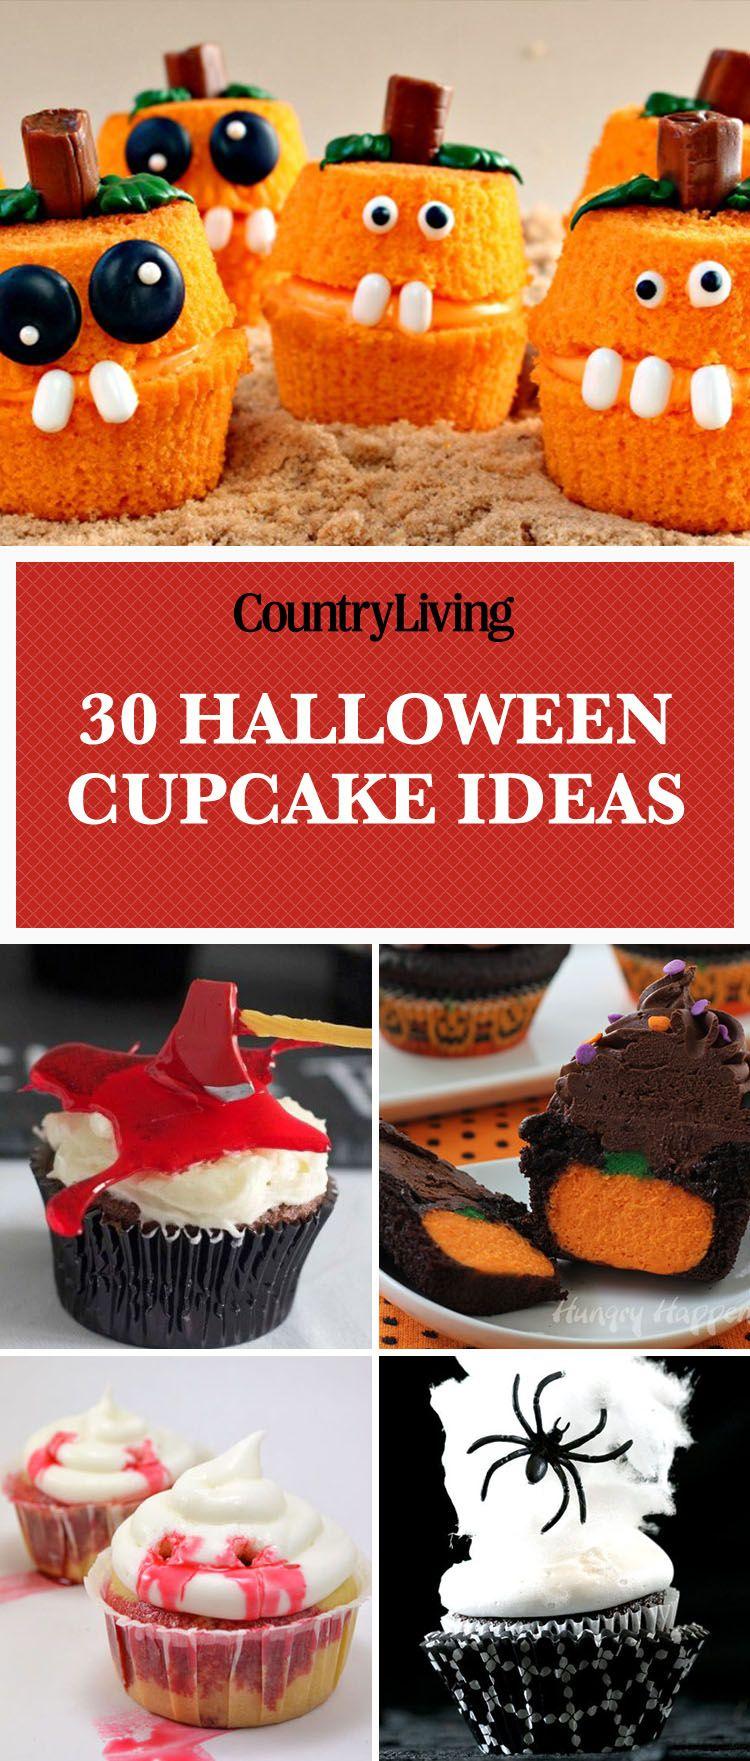 30 Halloween Cupcake Ideas - Easy Recipes for Cute Halloween Cupcakes